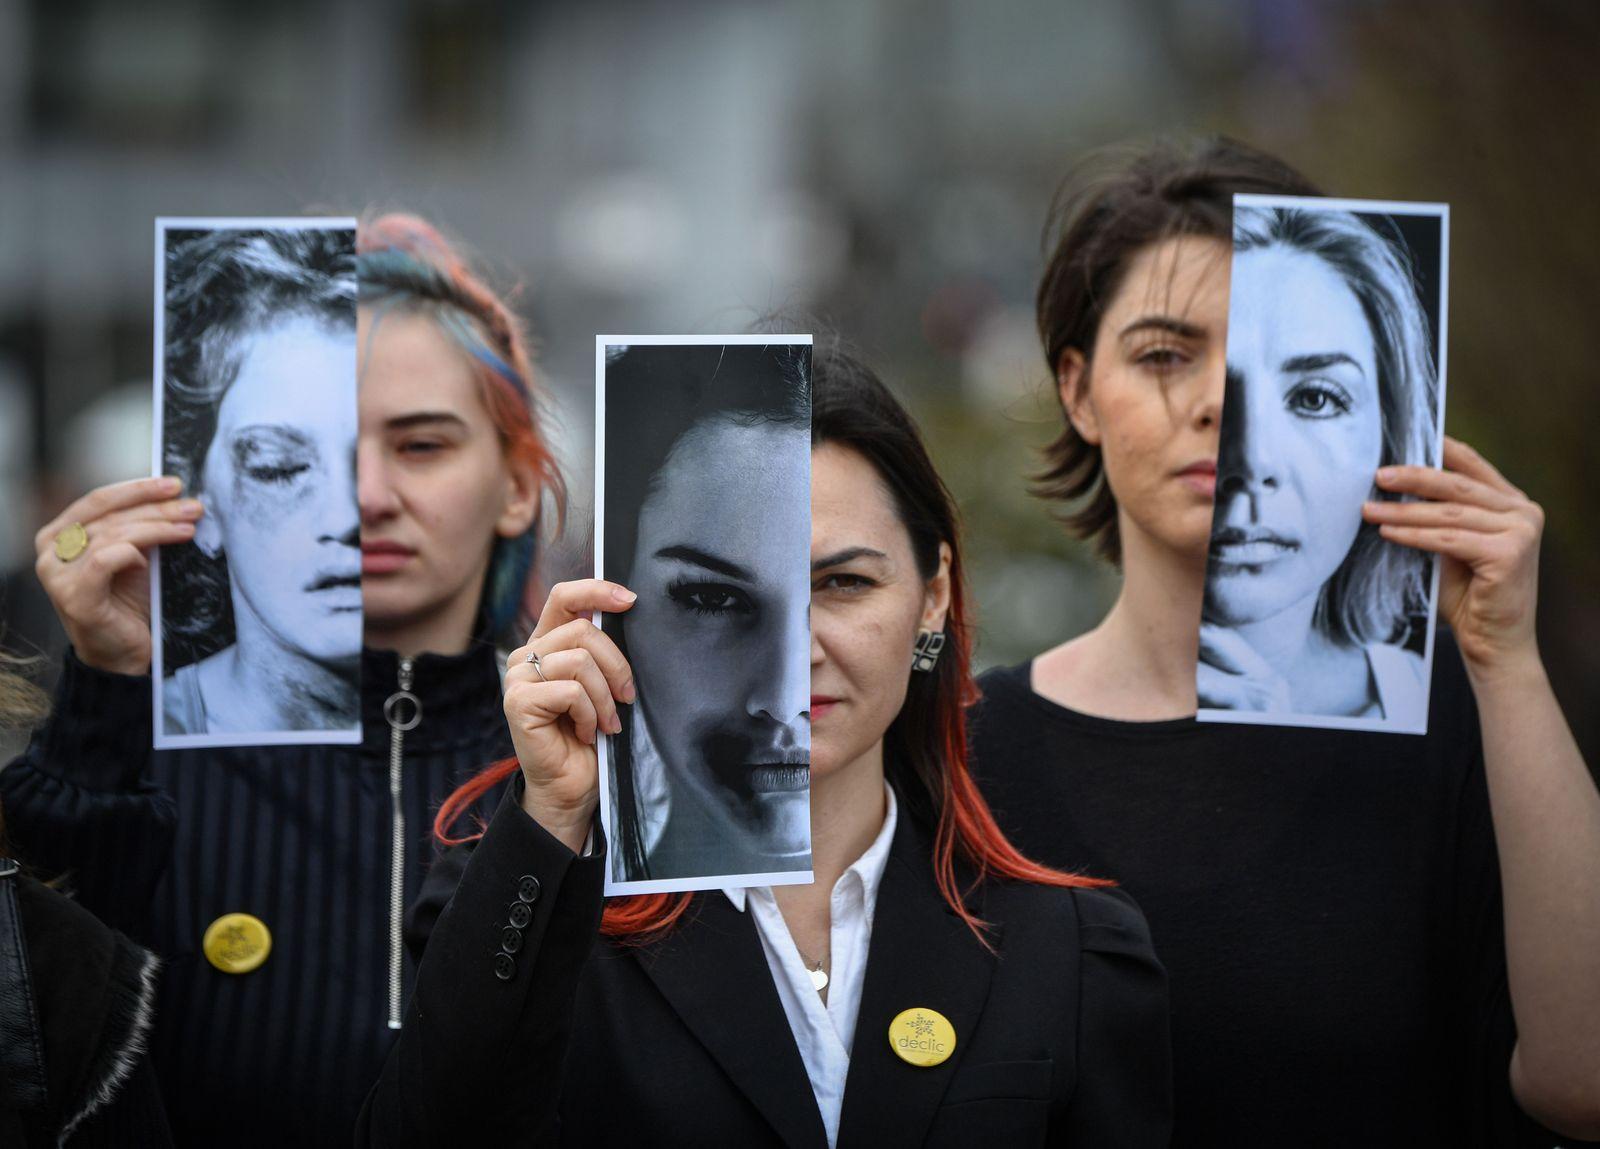 TOPSHOT-ROMANIA-WOMEN-VIOLENCE-PROTEST